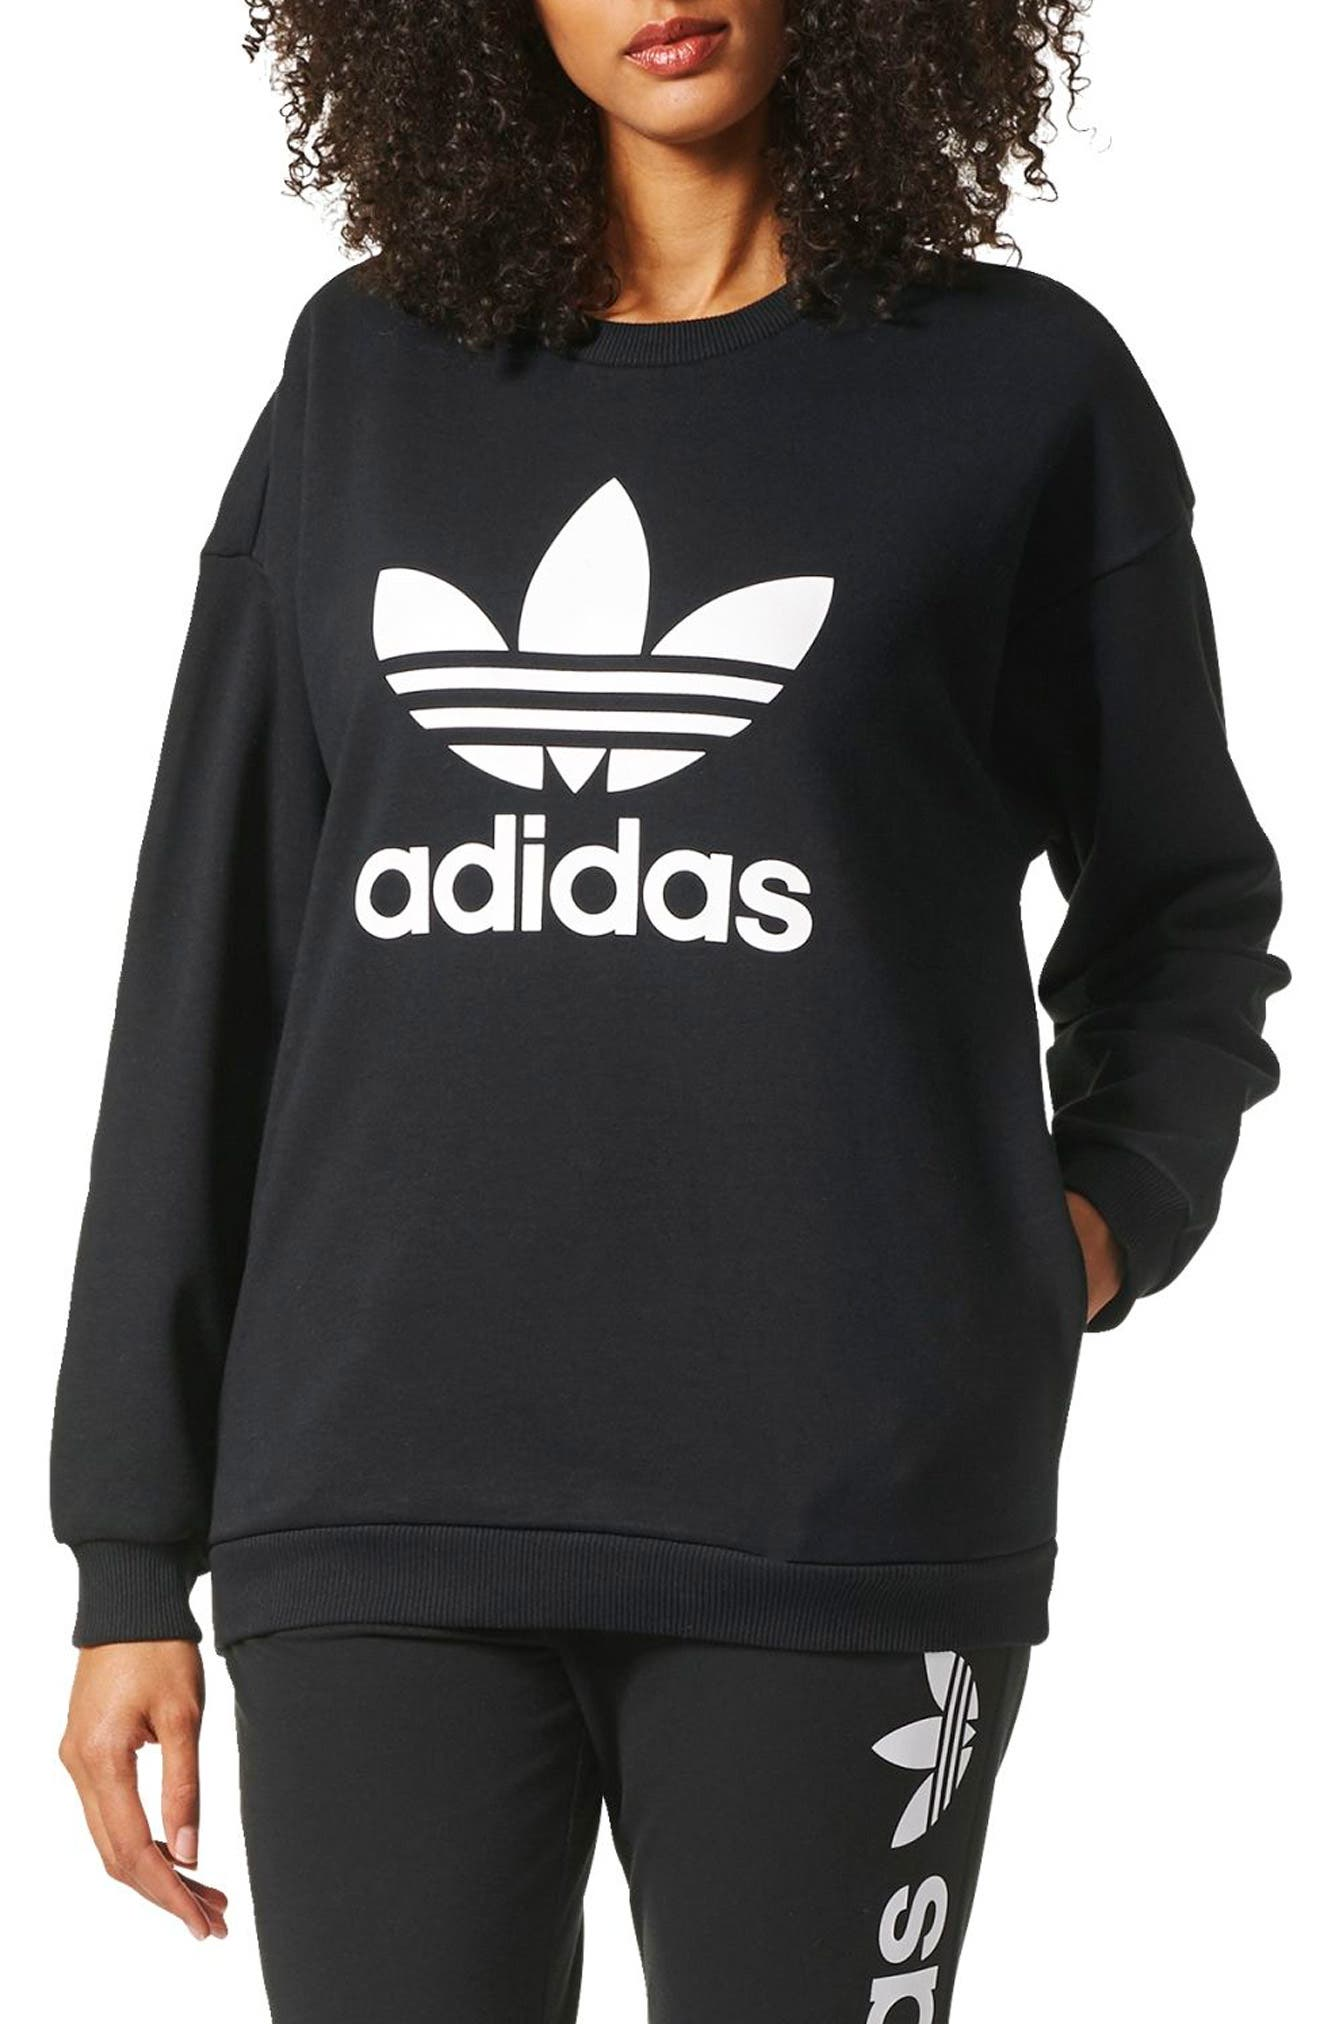 adidas hoodie womens. adidas originals trefoil crewneck sweatshirt hoodie womens